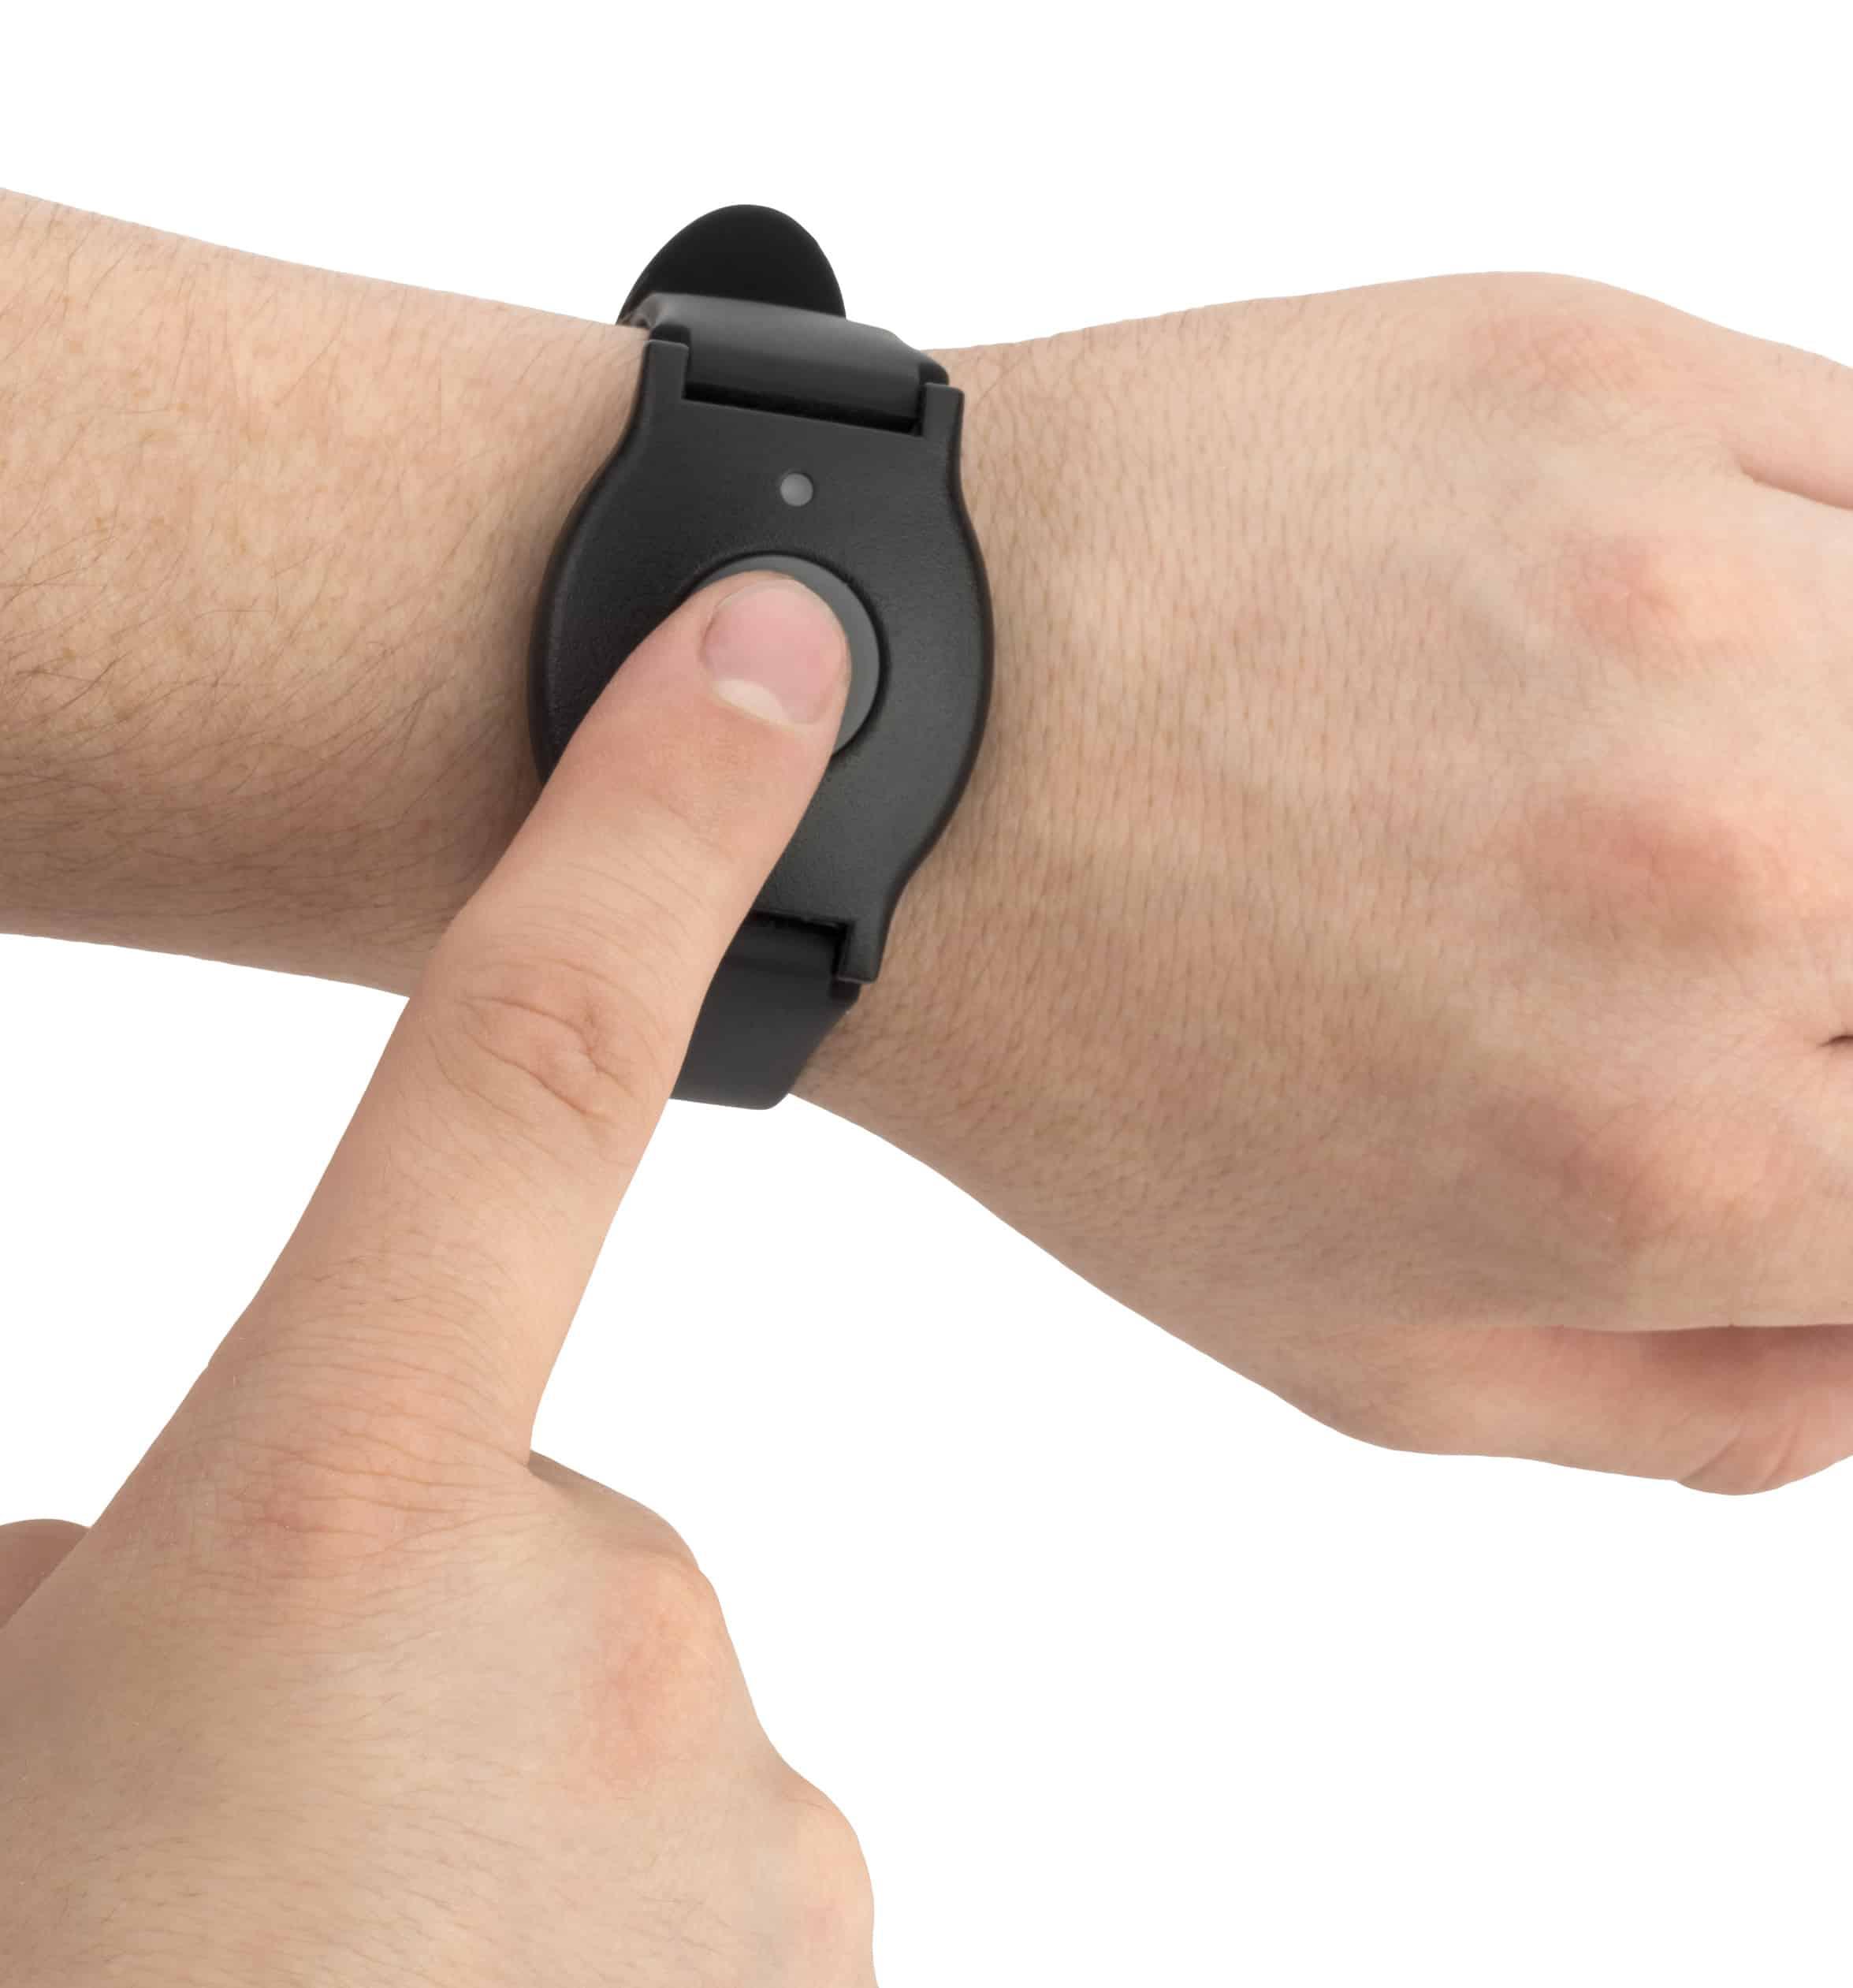 Wearing the LifeFone wristband